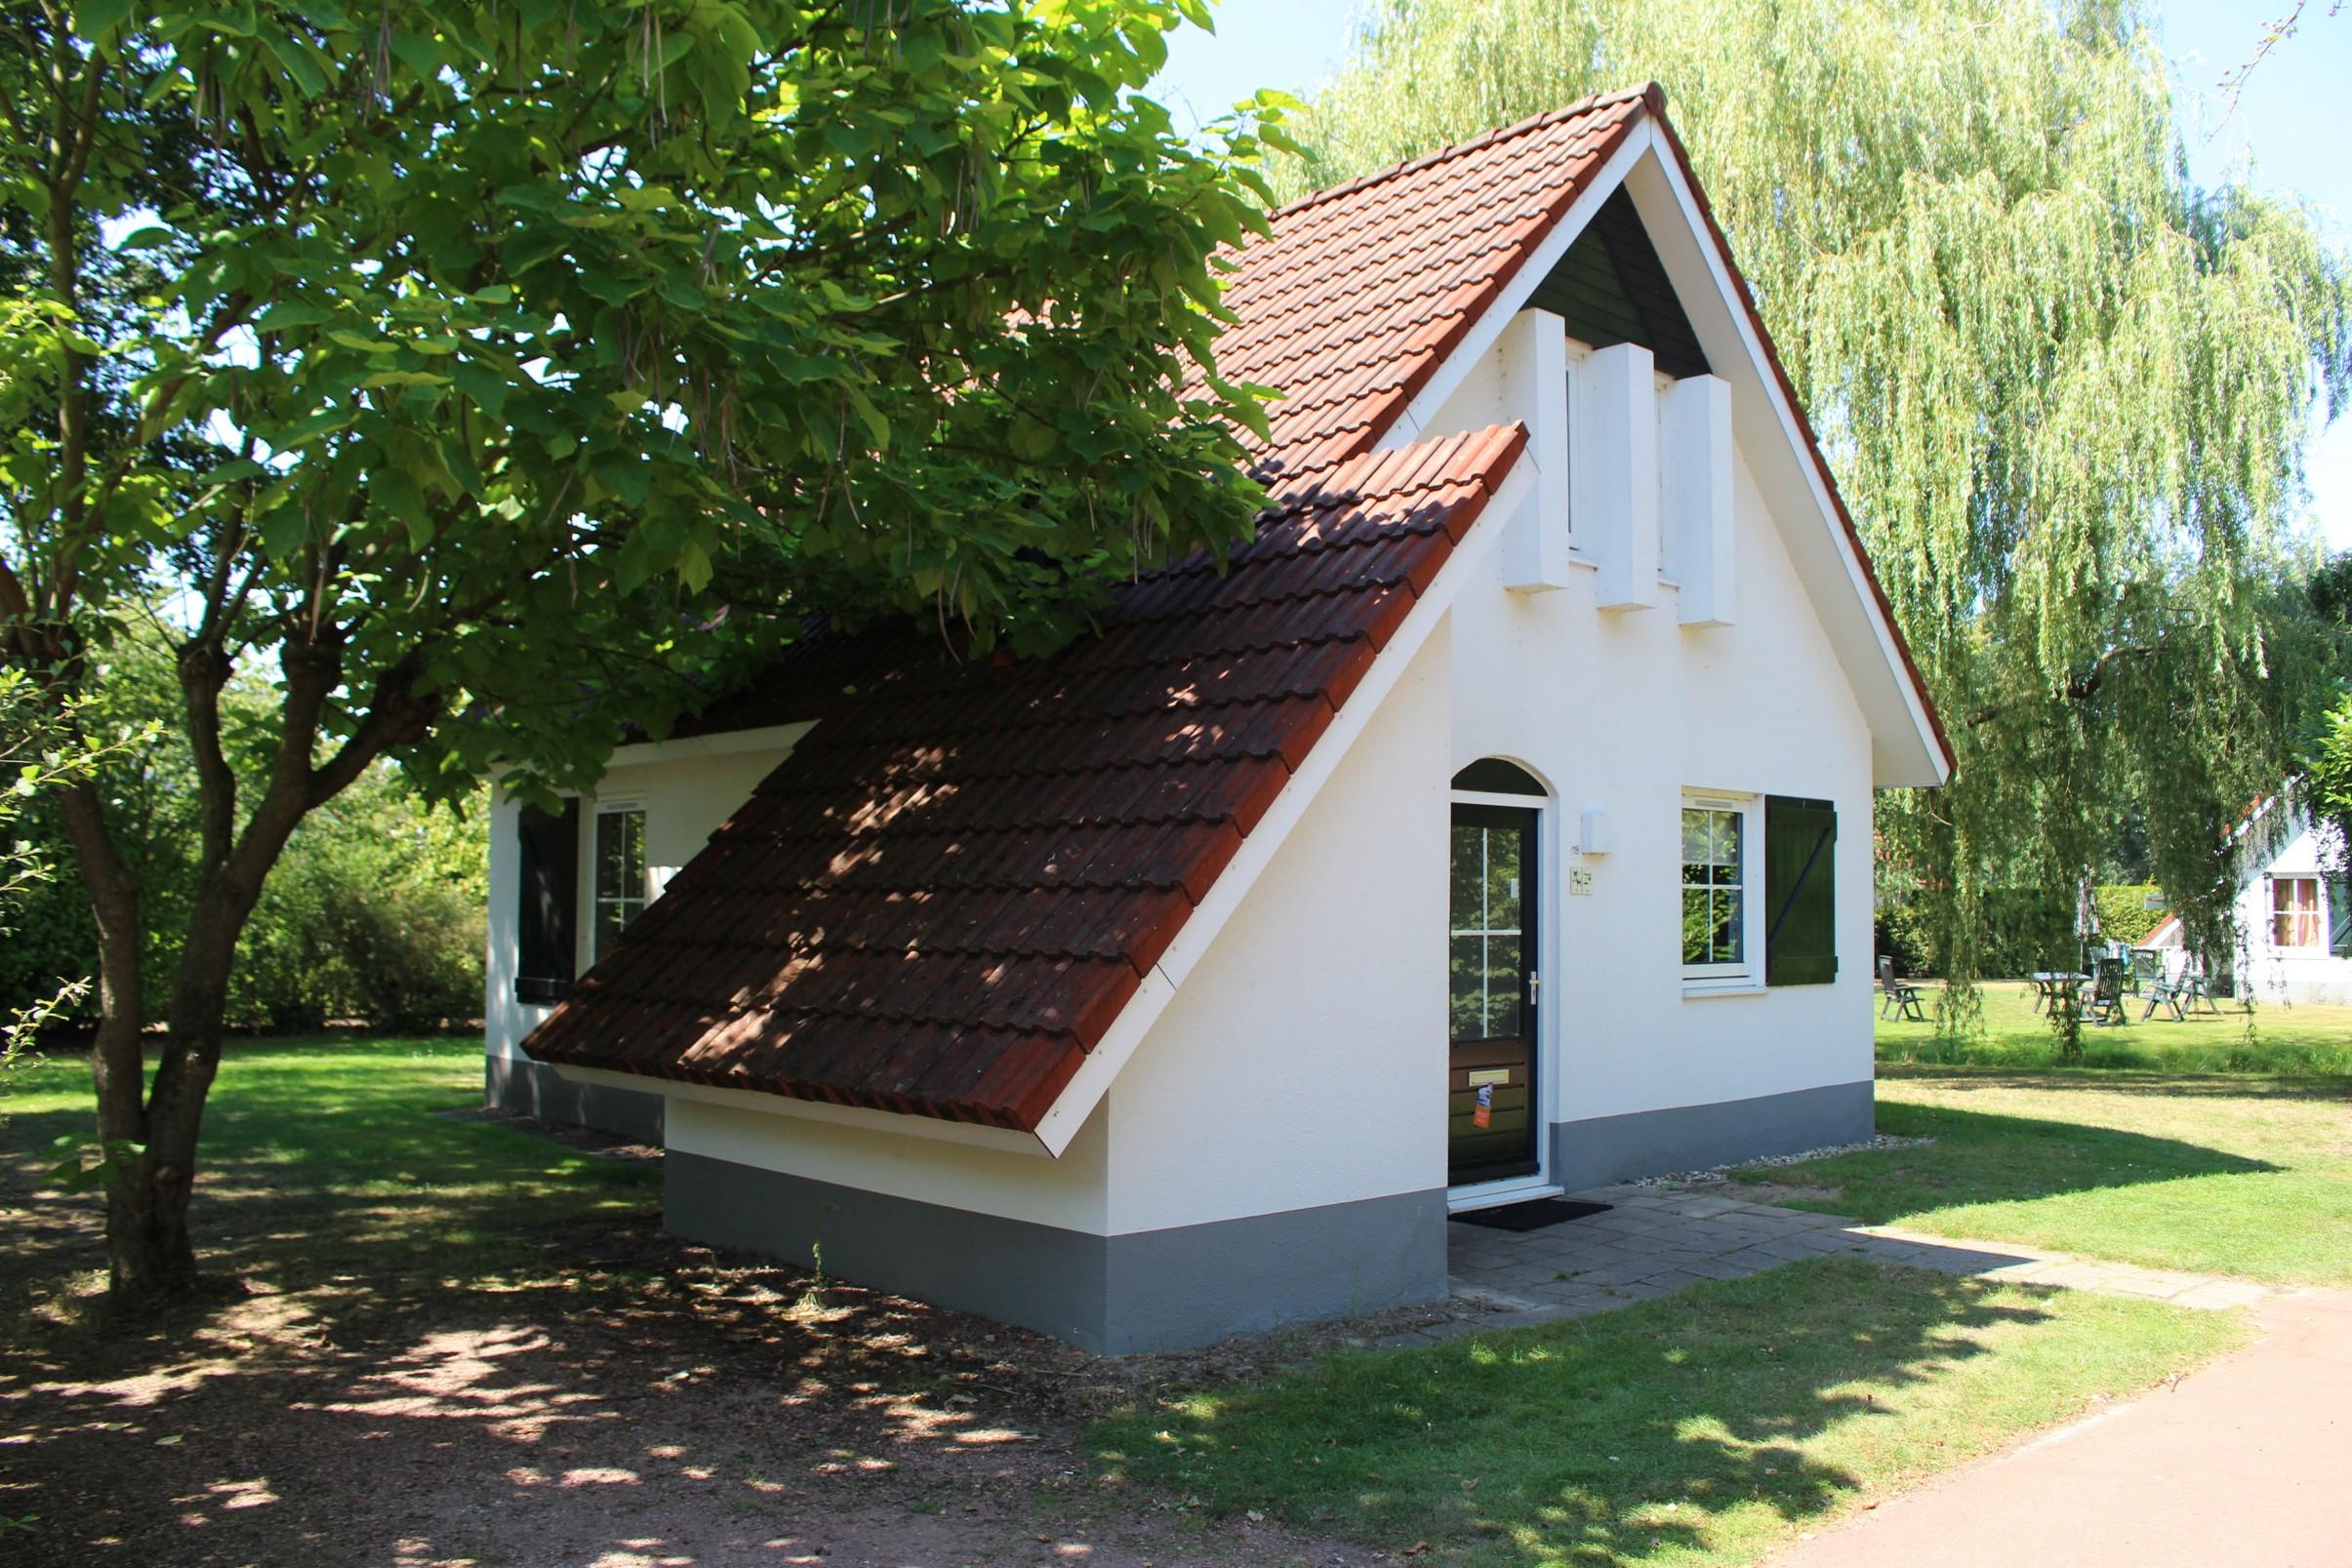 1. Landal Landgoed De Elsgraven nr. 118 - 4-pers. Comfort